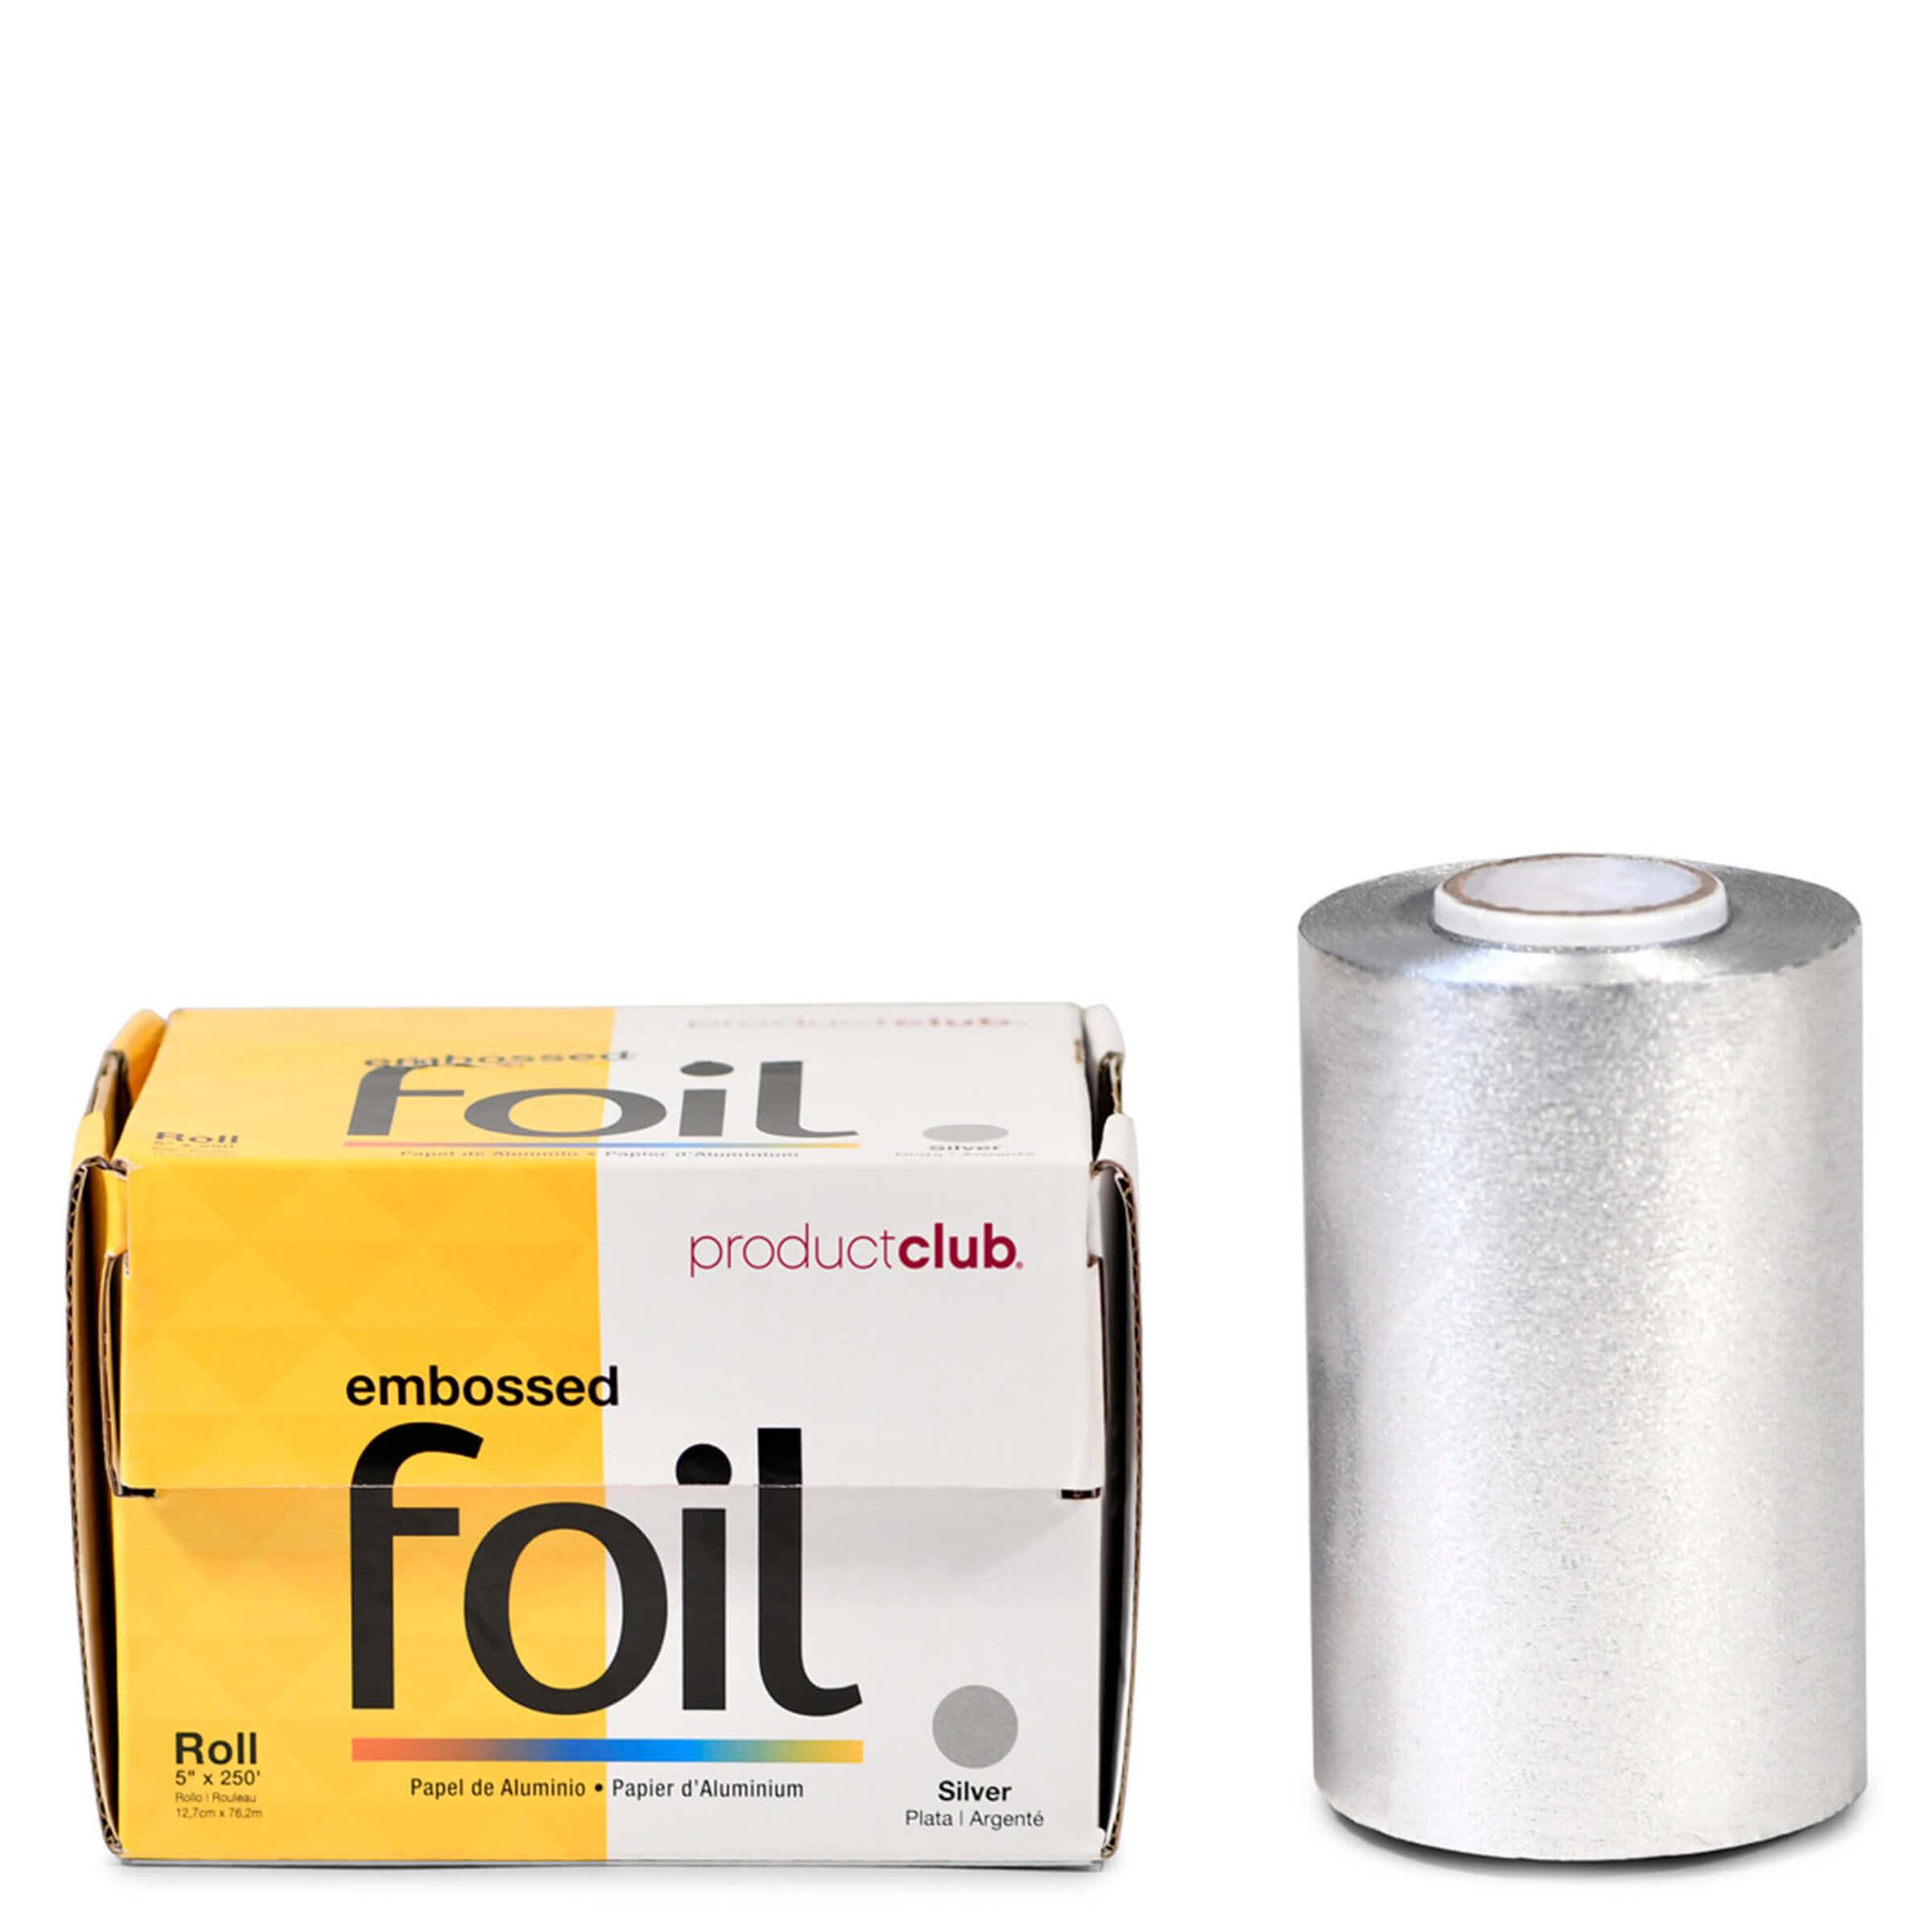 RFE-250S Hair Dye Foil